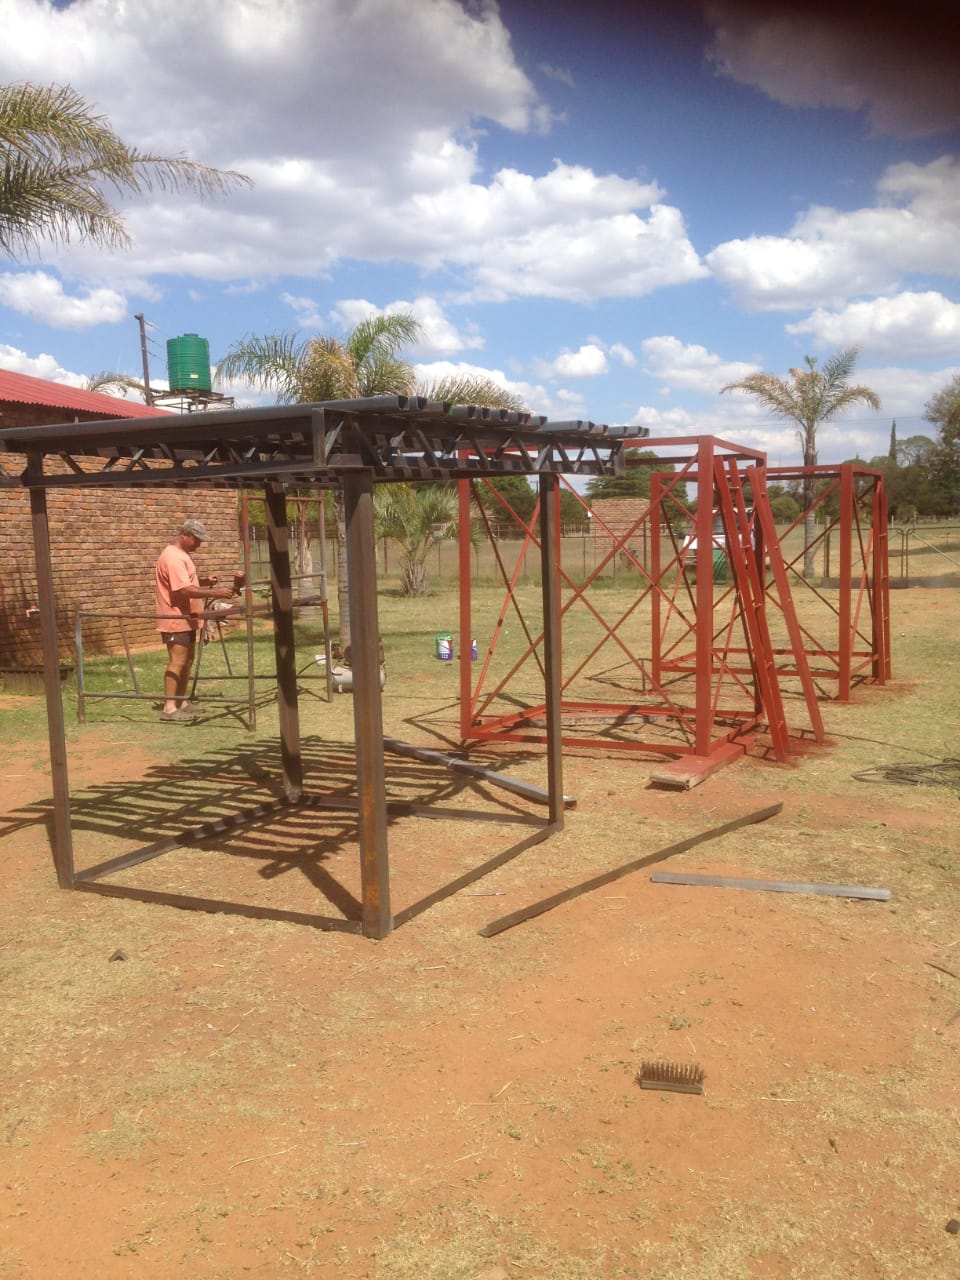 Watertank stands